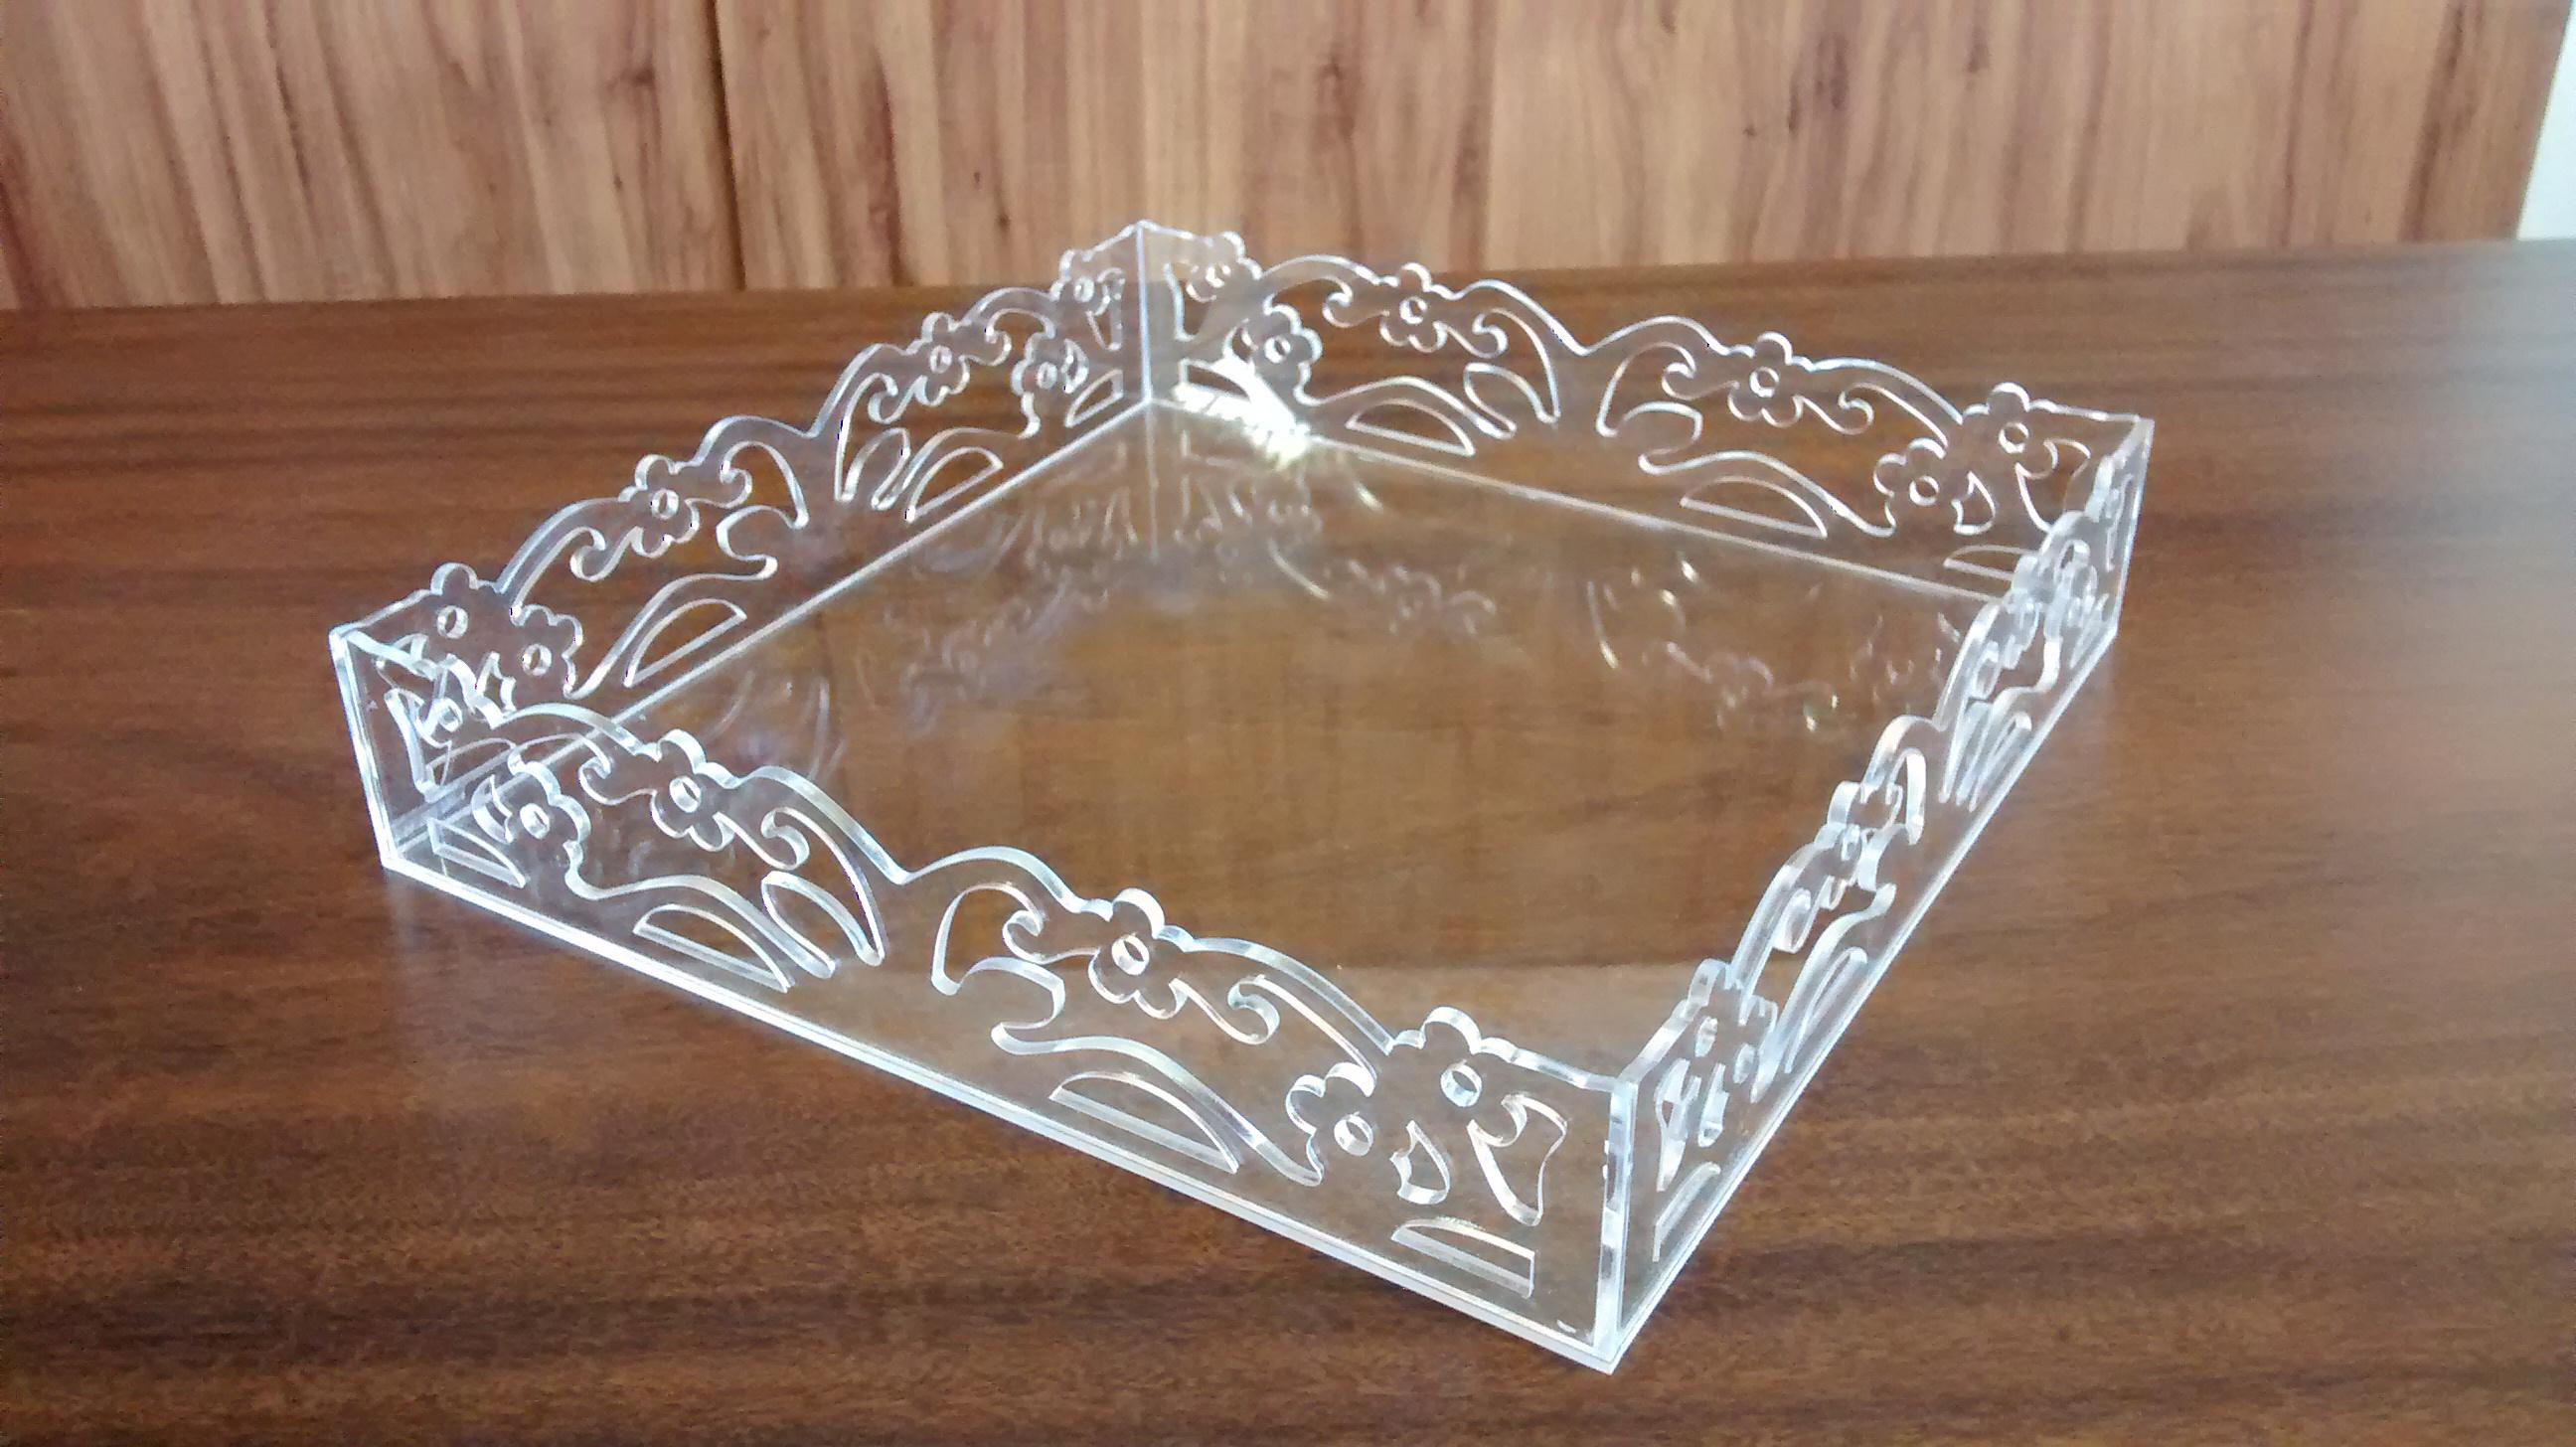 Bolsa De Festa De Acrilico : Bandeja de acr?lico cristal kuka legal artesanatos elo